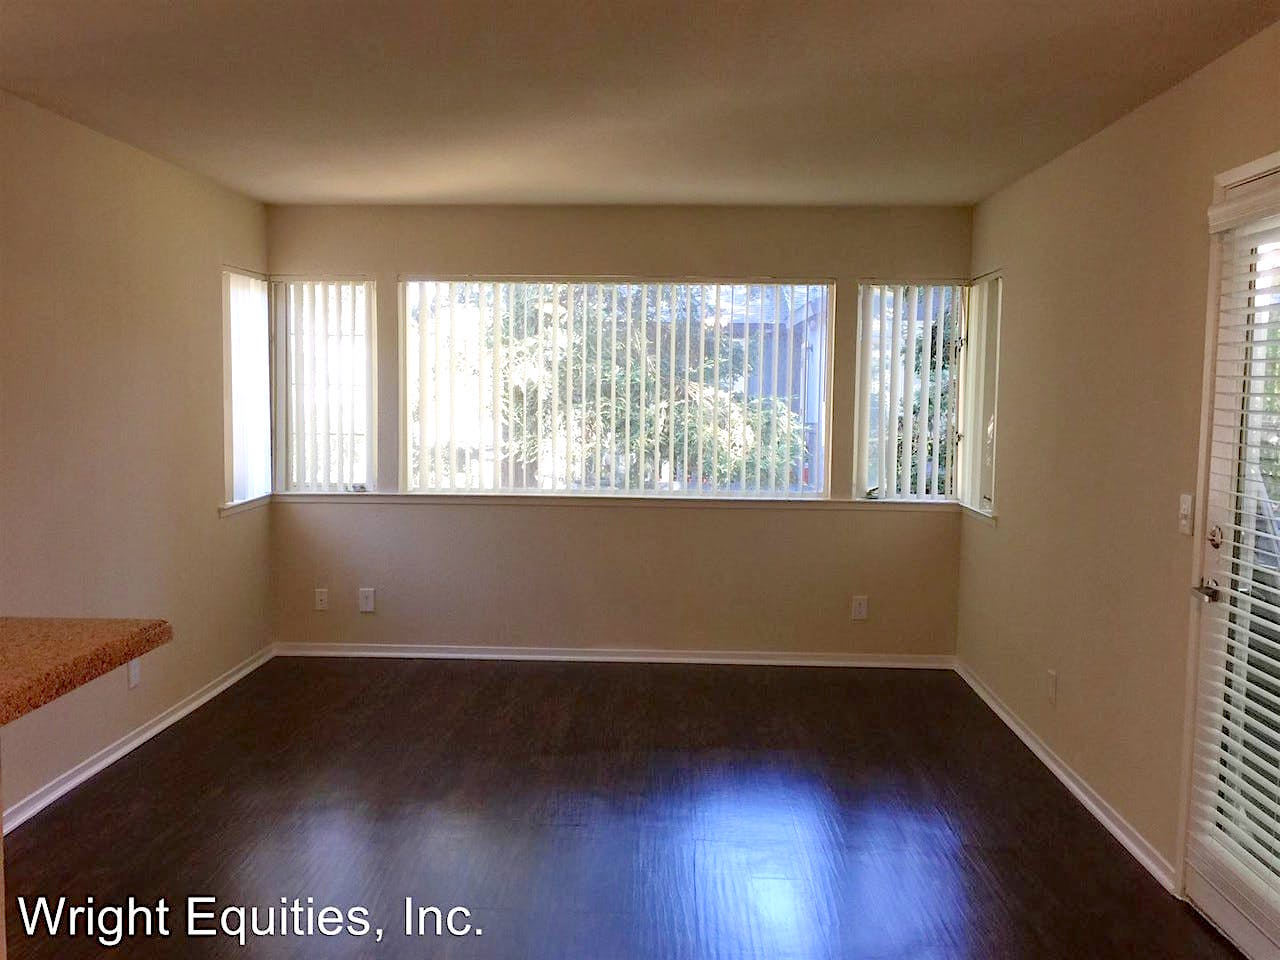 6655 N. Fresno St. | Photos: Zumper